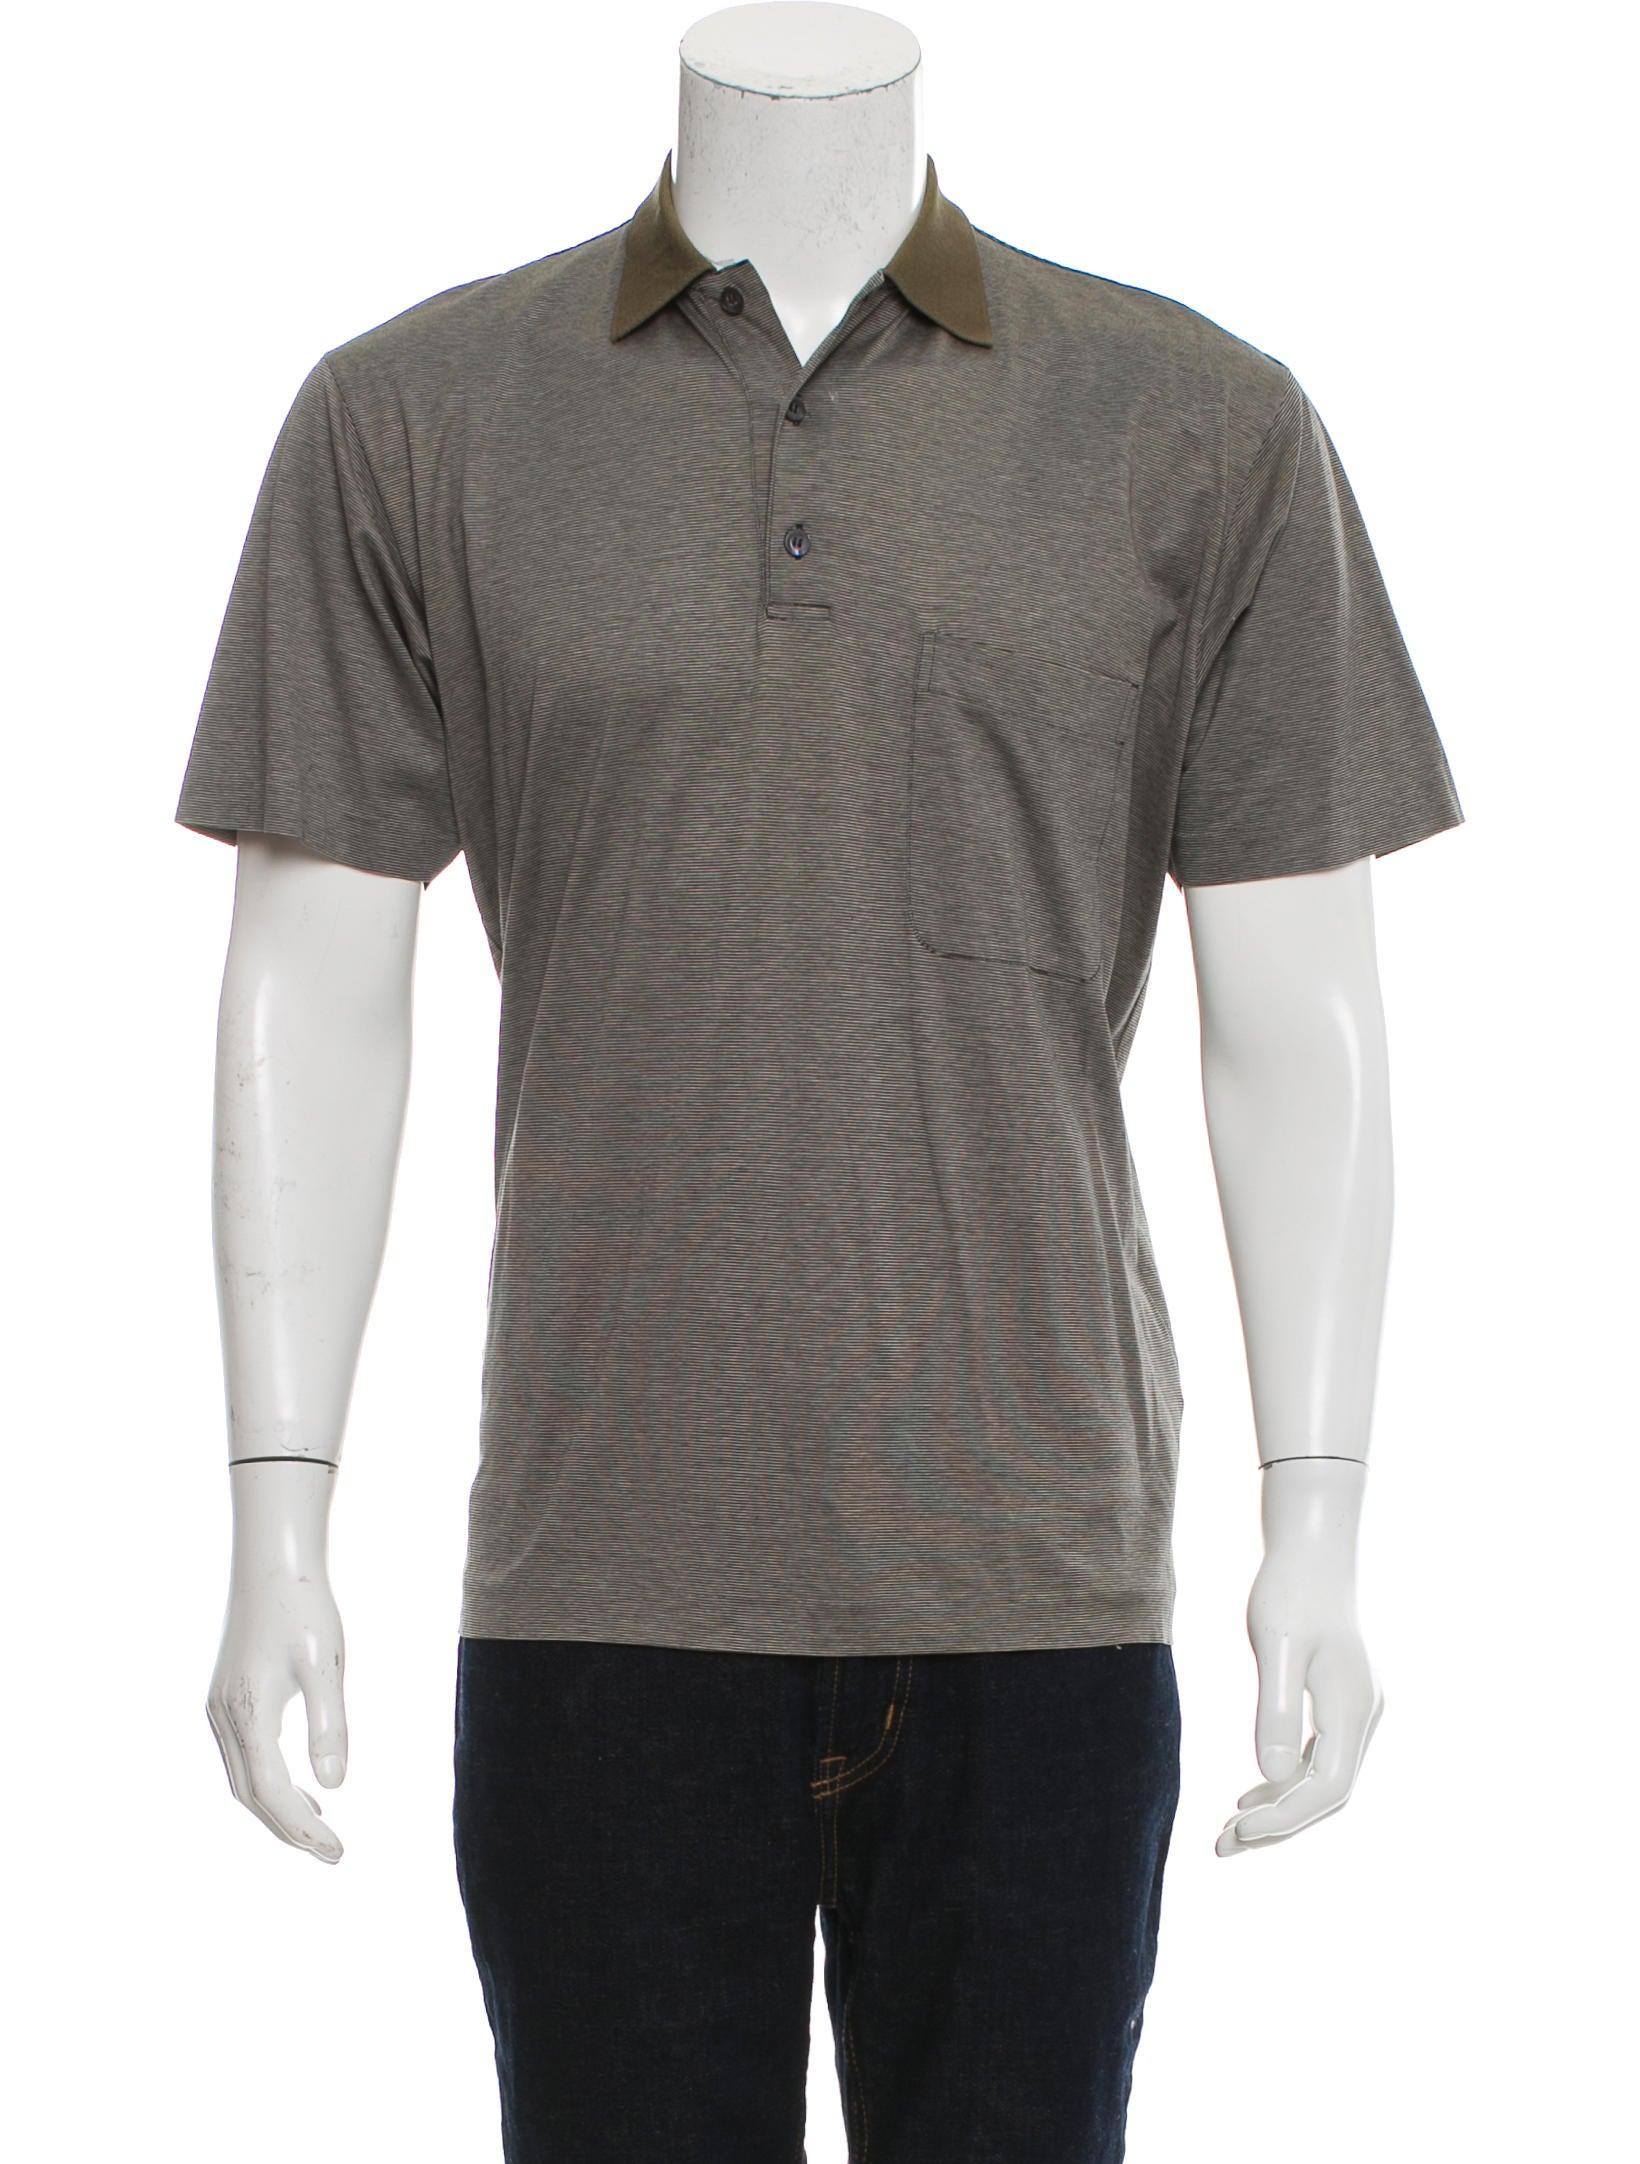 Ermenegildo zegna striped polo shirt clothing zgn25574 for Zegna polo shirts sale